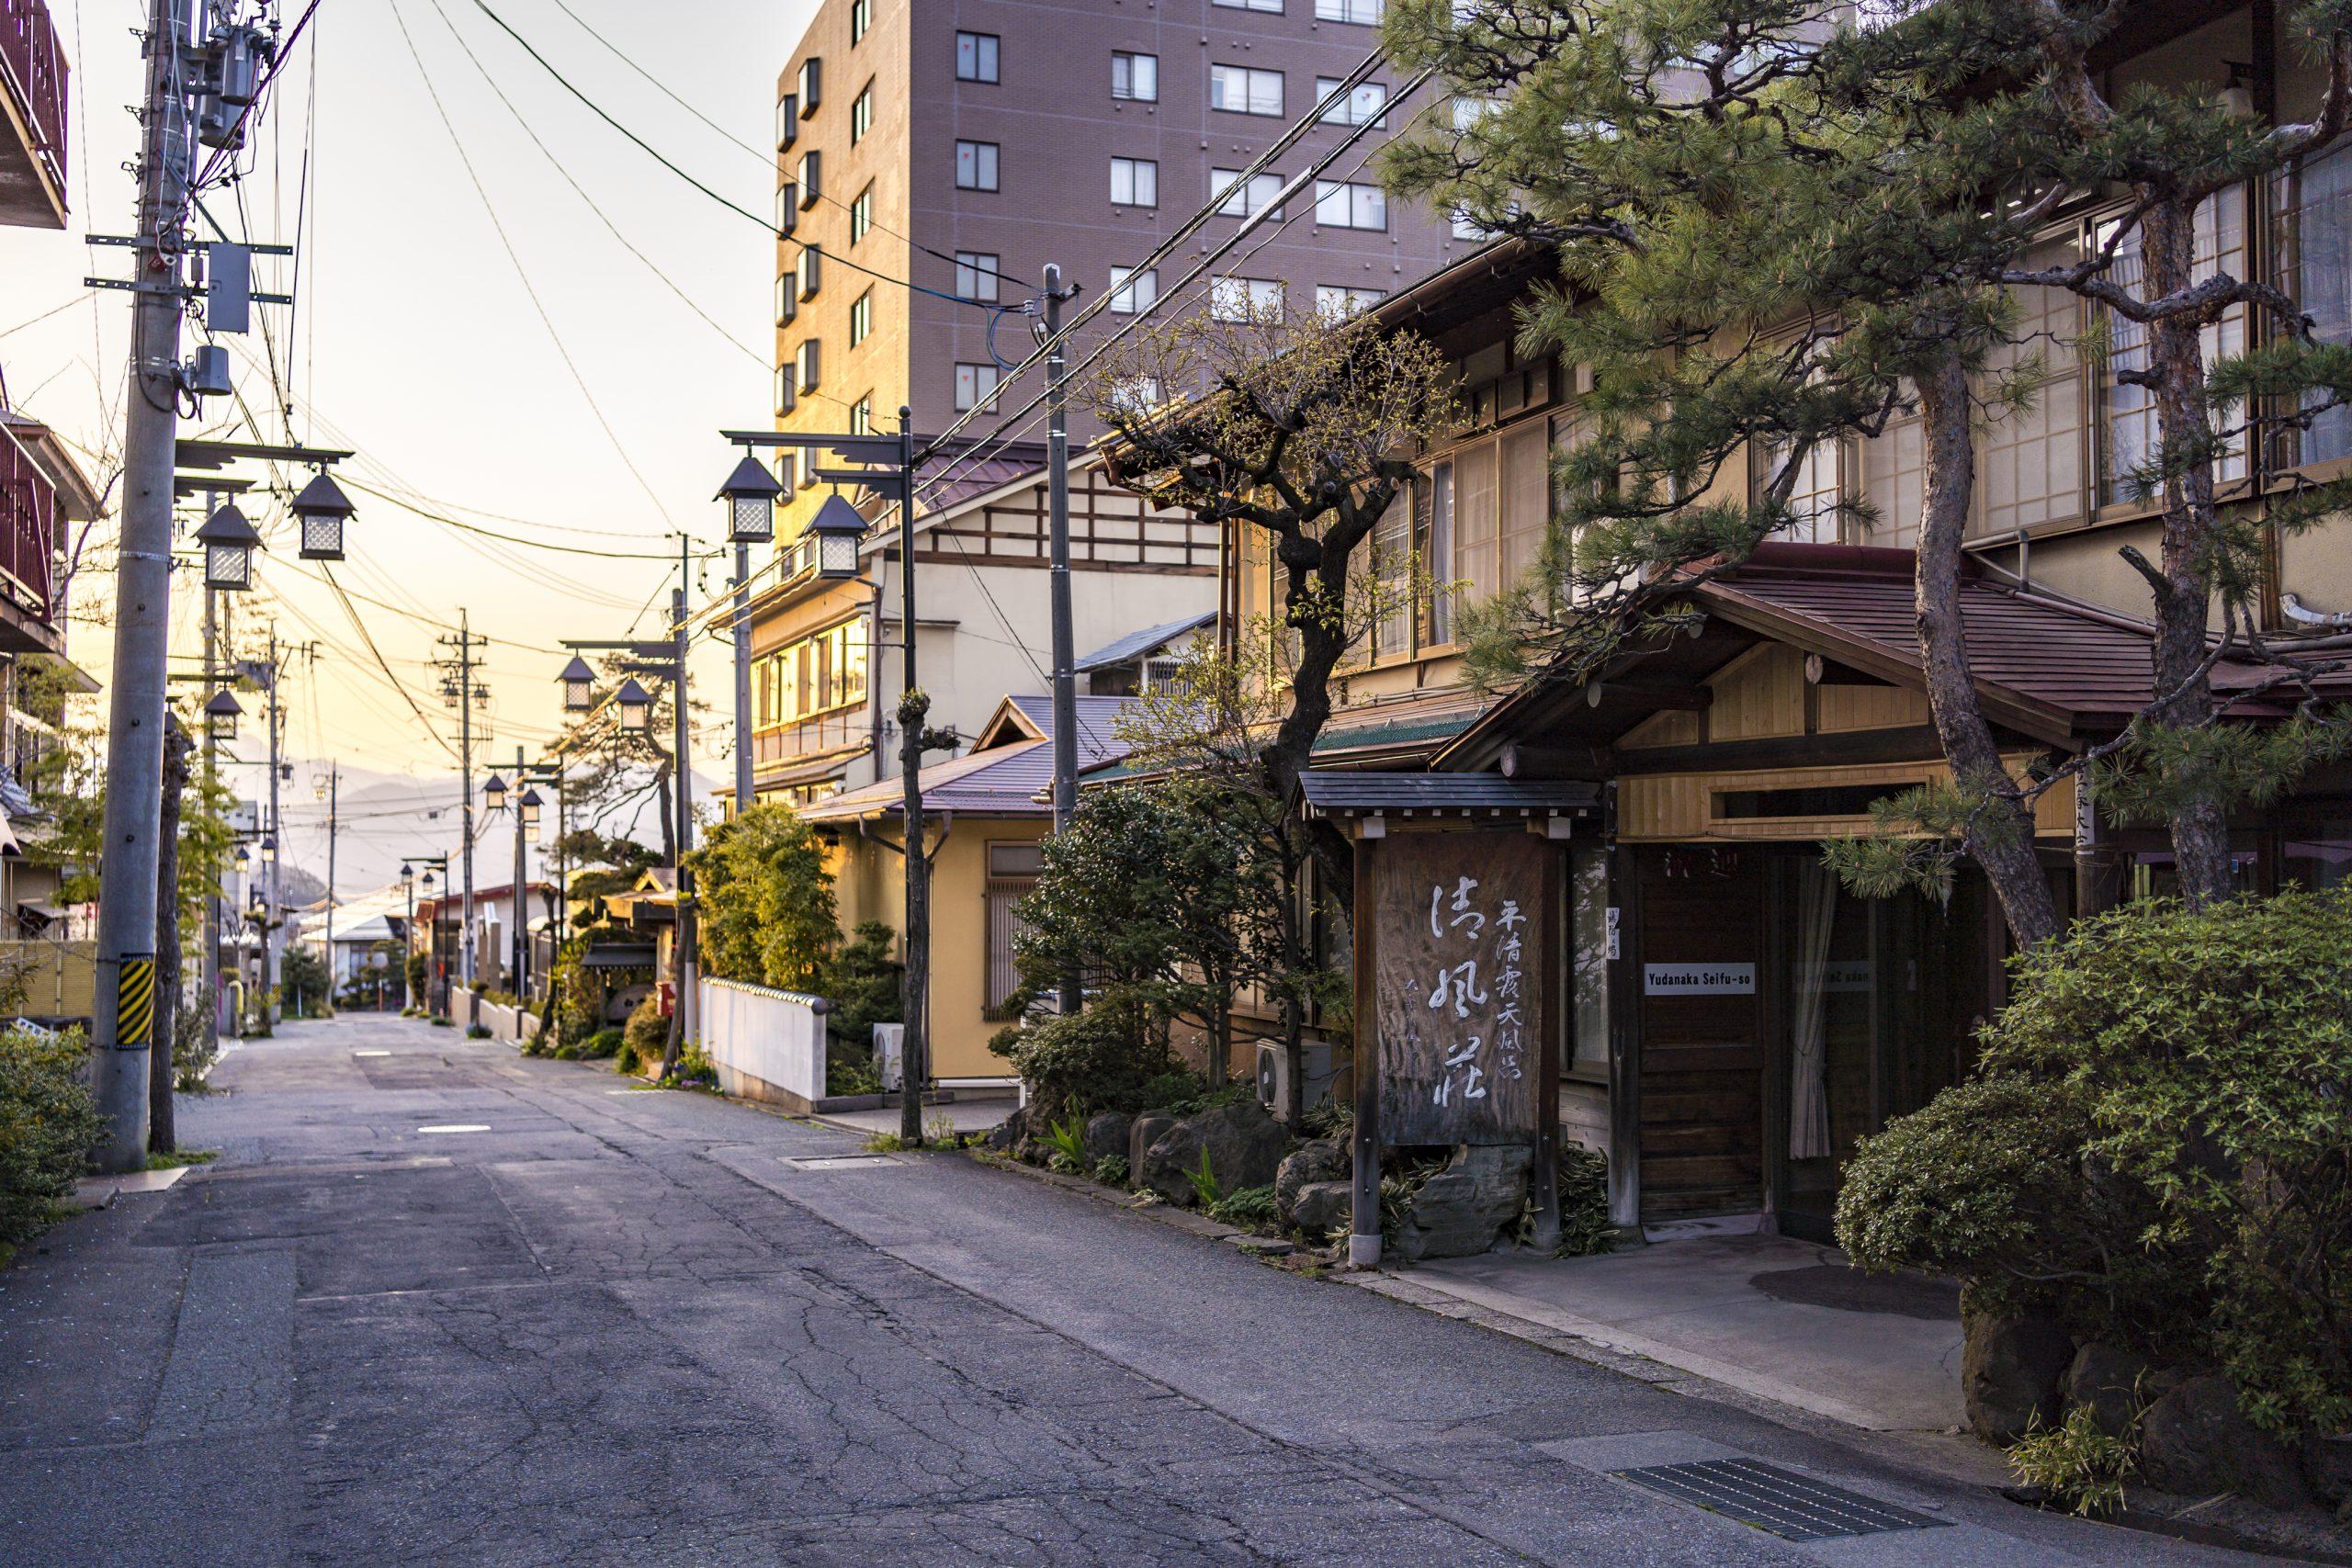 yudanaka-onsen-seifuso-ryokan-yamanouchi